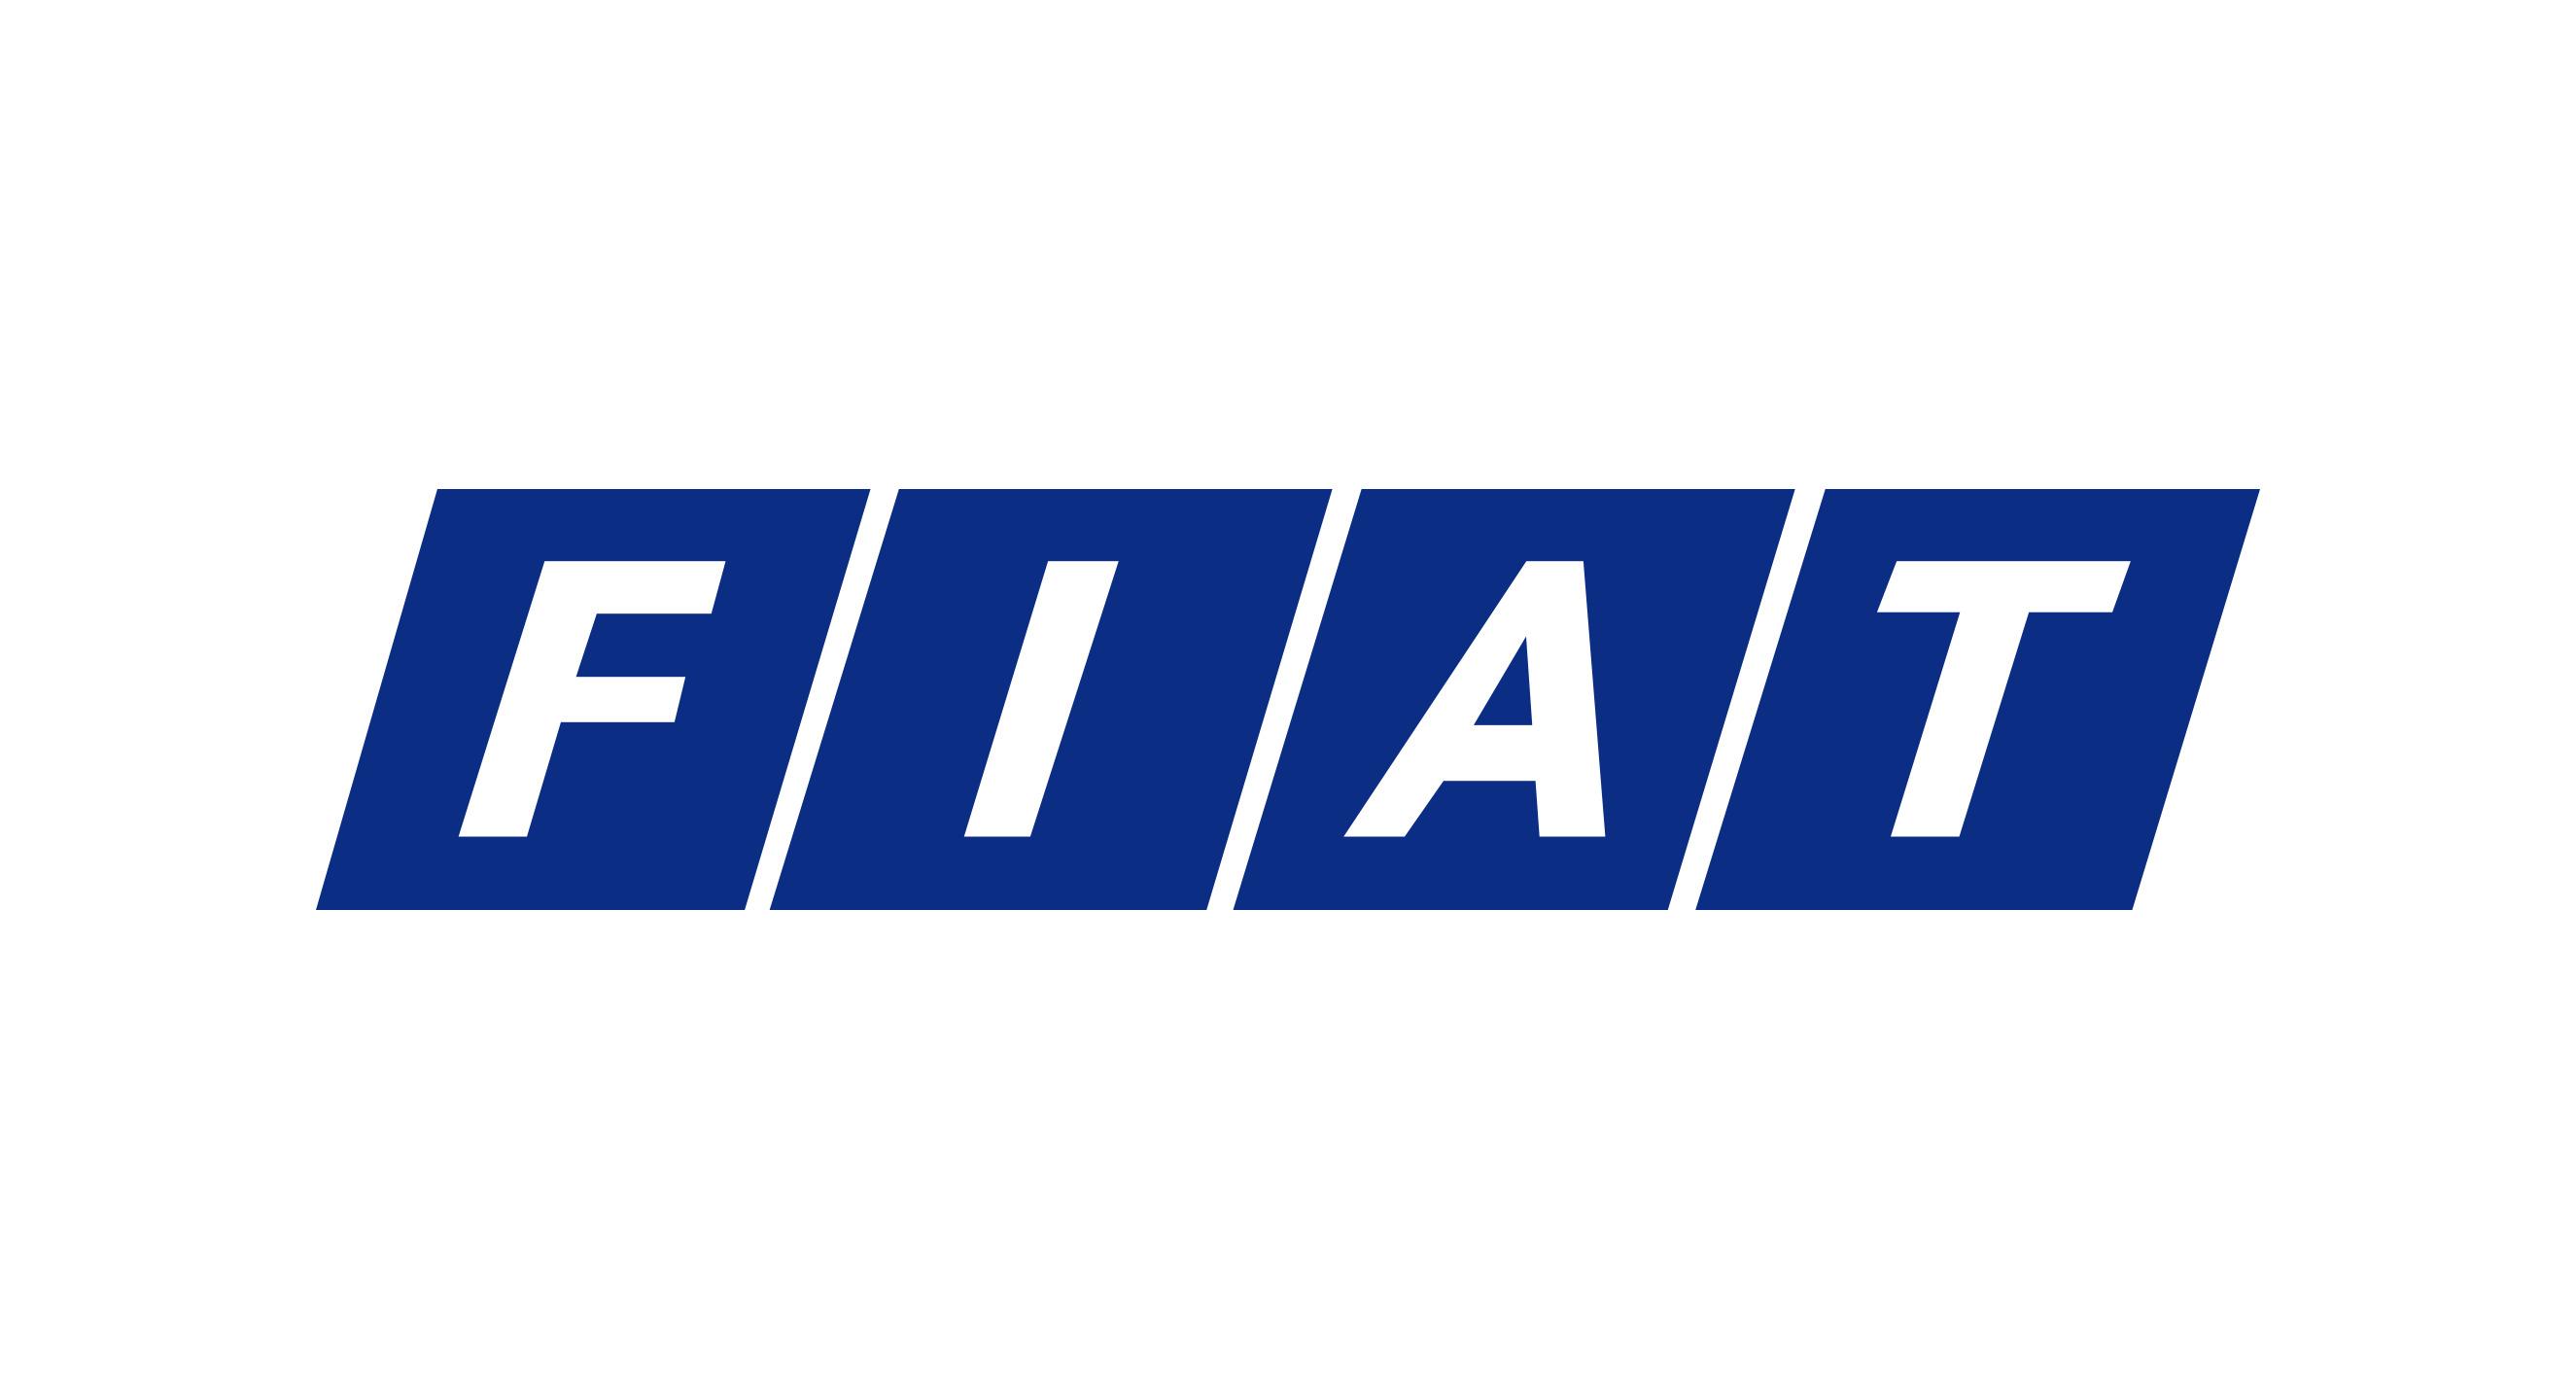 Imagen logo de Fiat